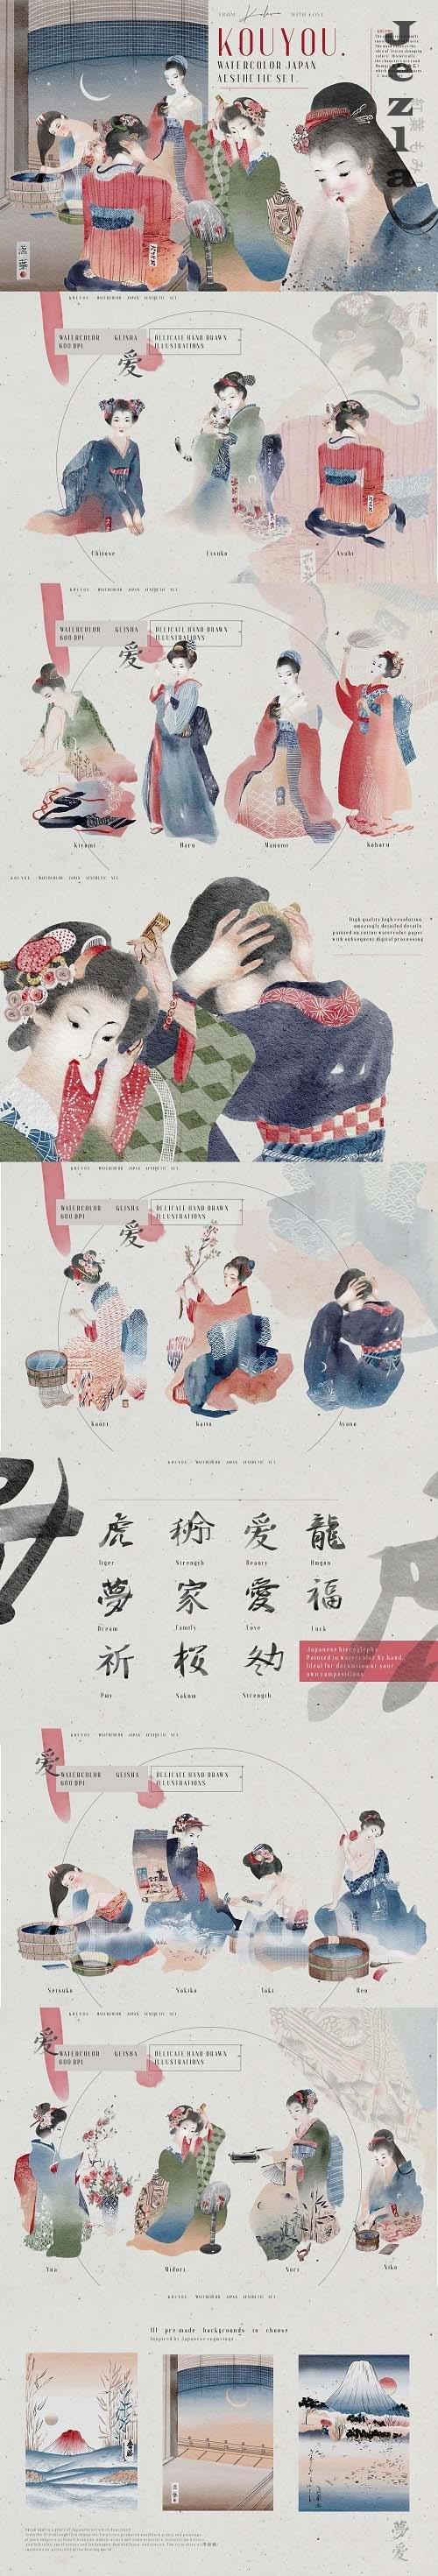 Kouyou - Watercolor Japanese Set II - 5489985